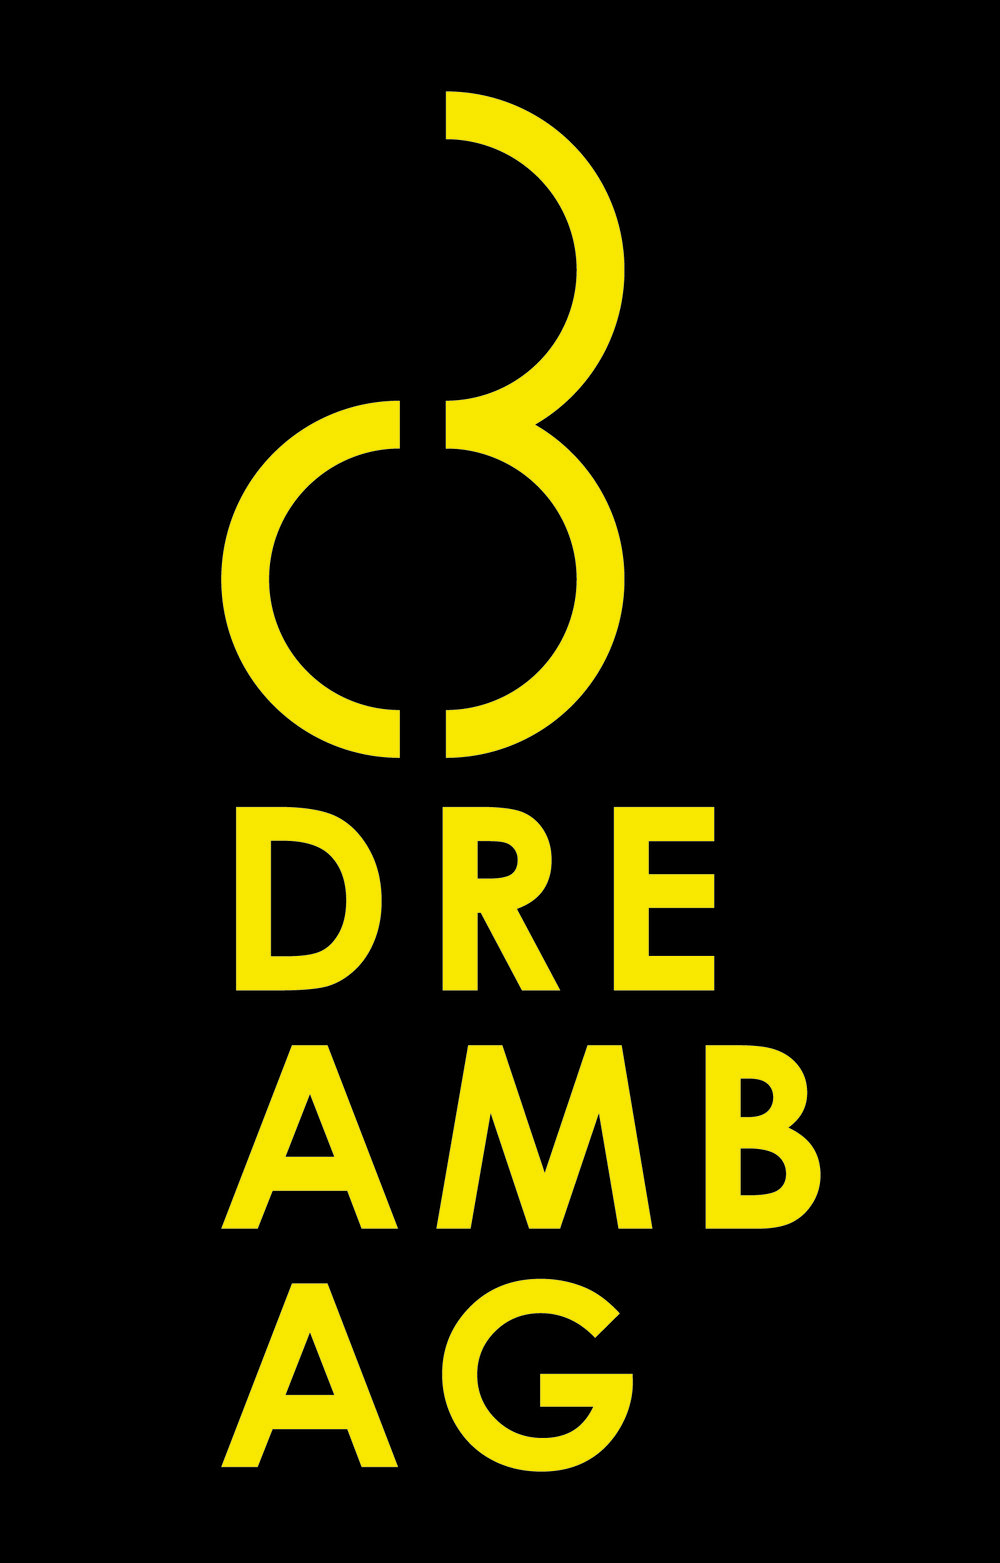 DB_Logo_Svart_Gul_Portrait.jpg